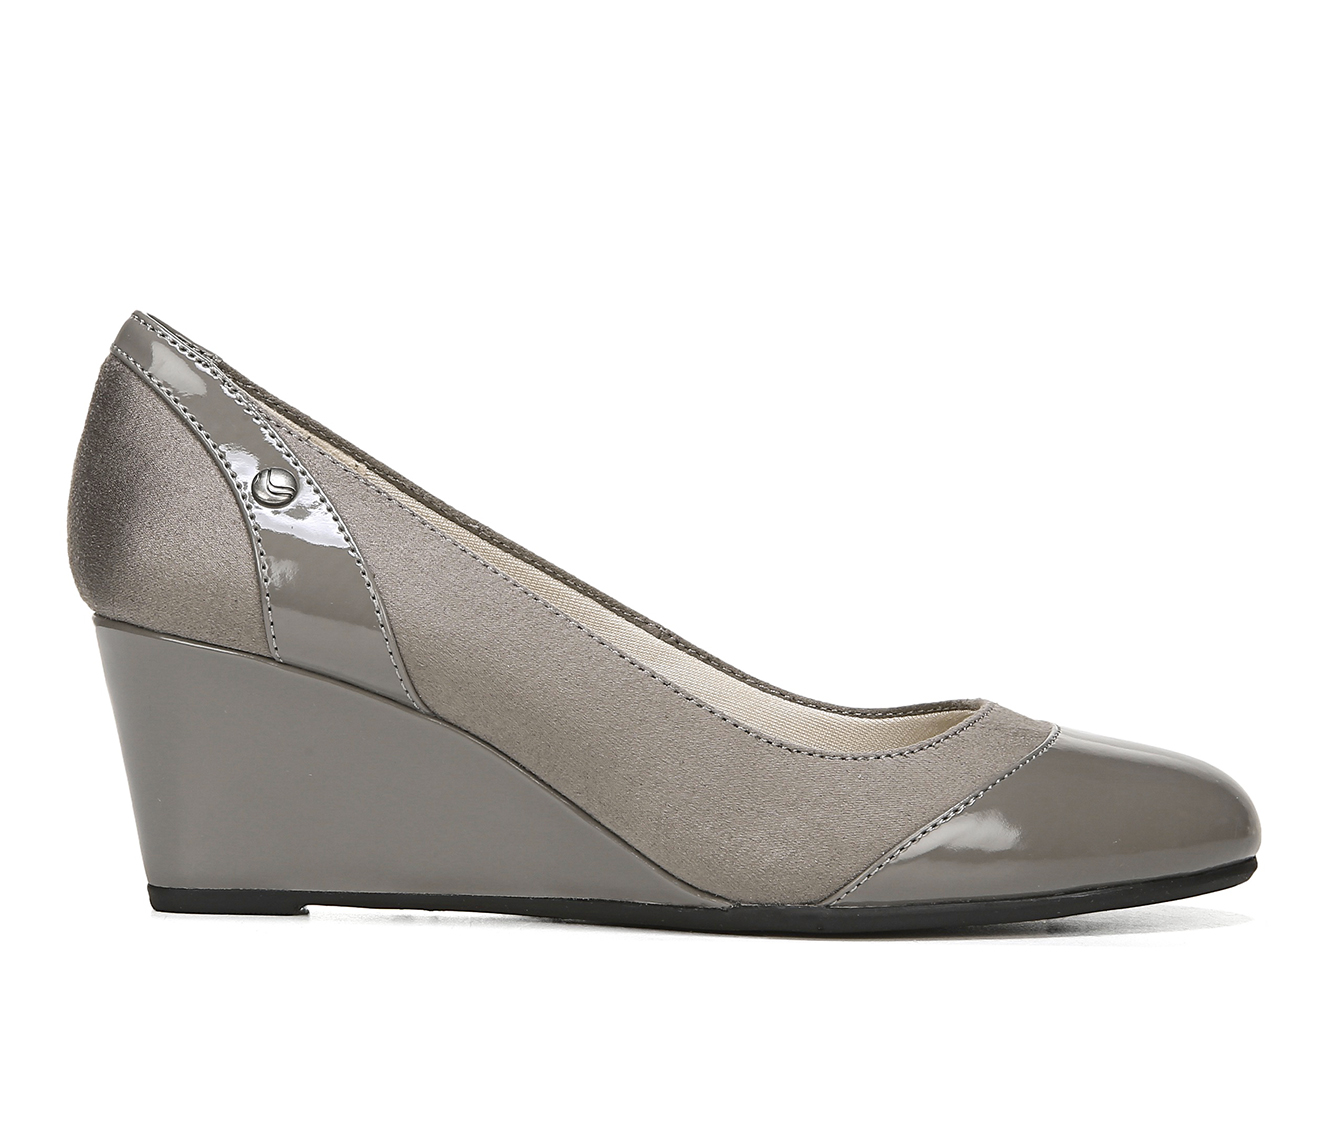 LifeStride Dreams Women's Dress Shoe (Gray Canvas)